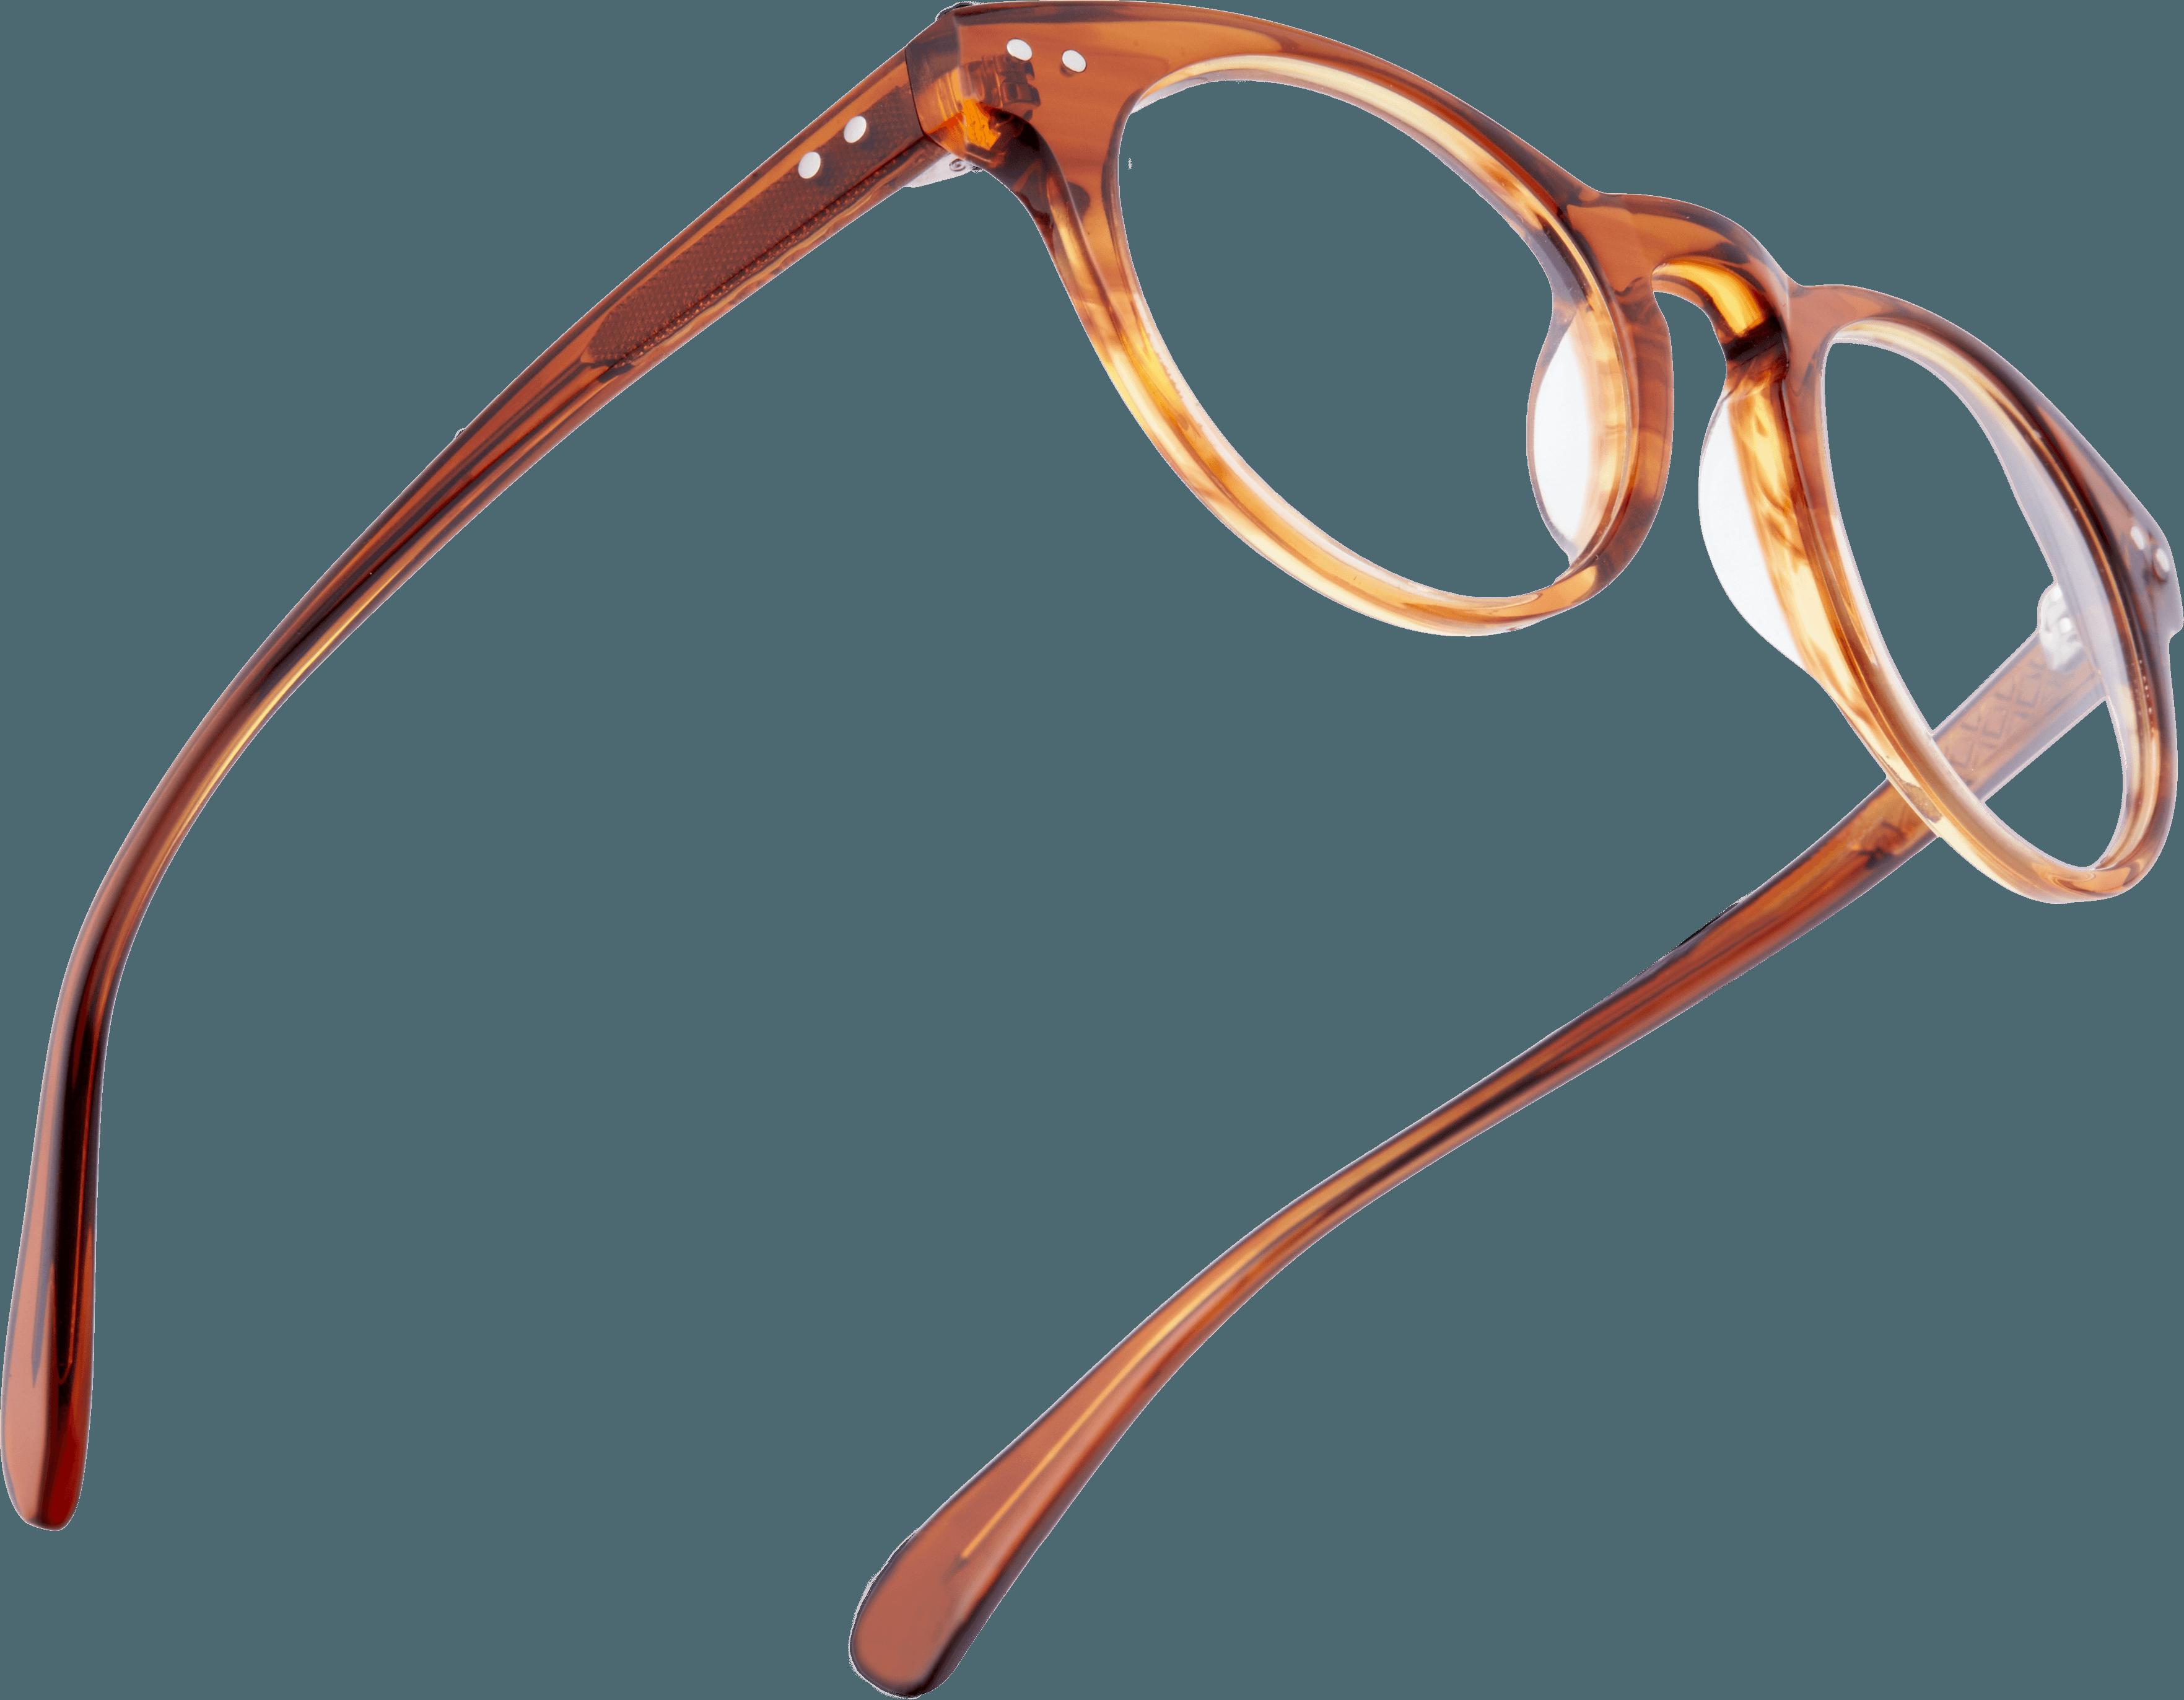 Lens sunglass free on. Sunglasses clipart glass frame